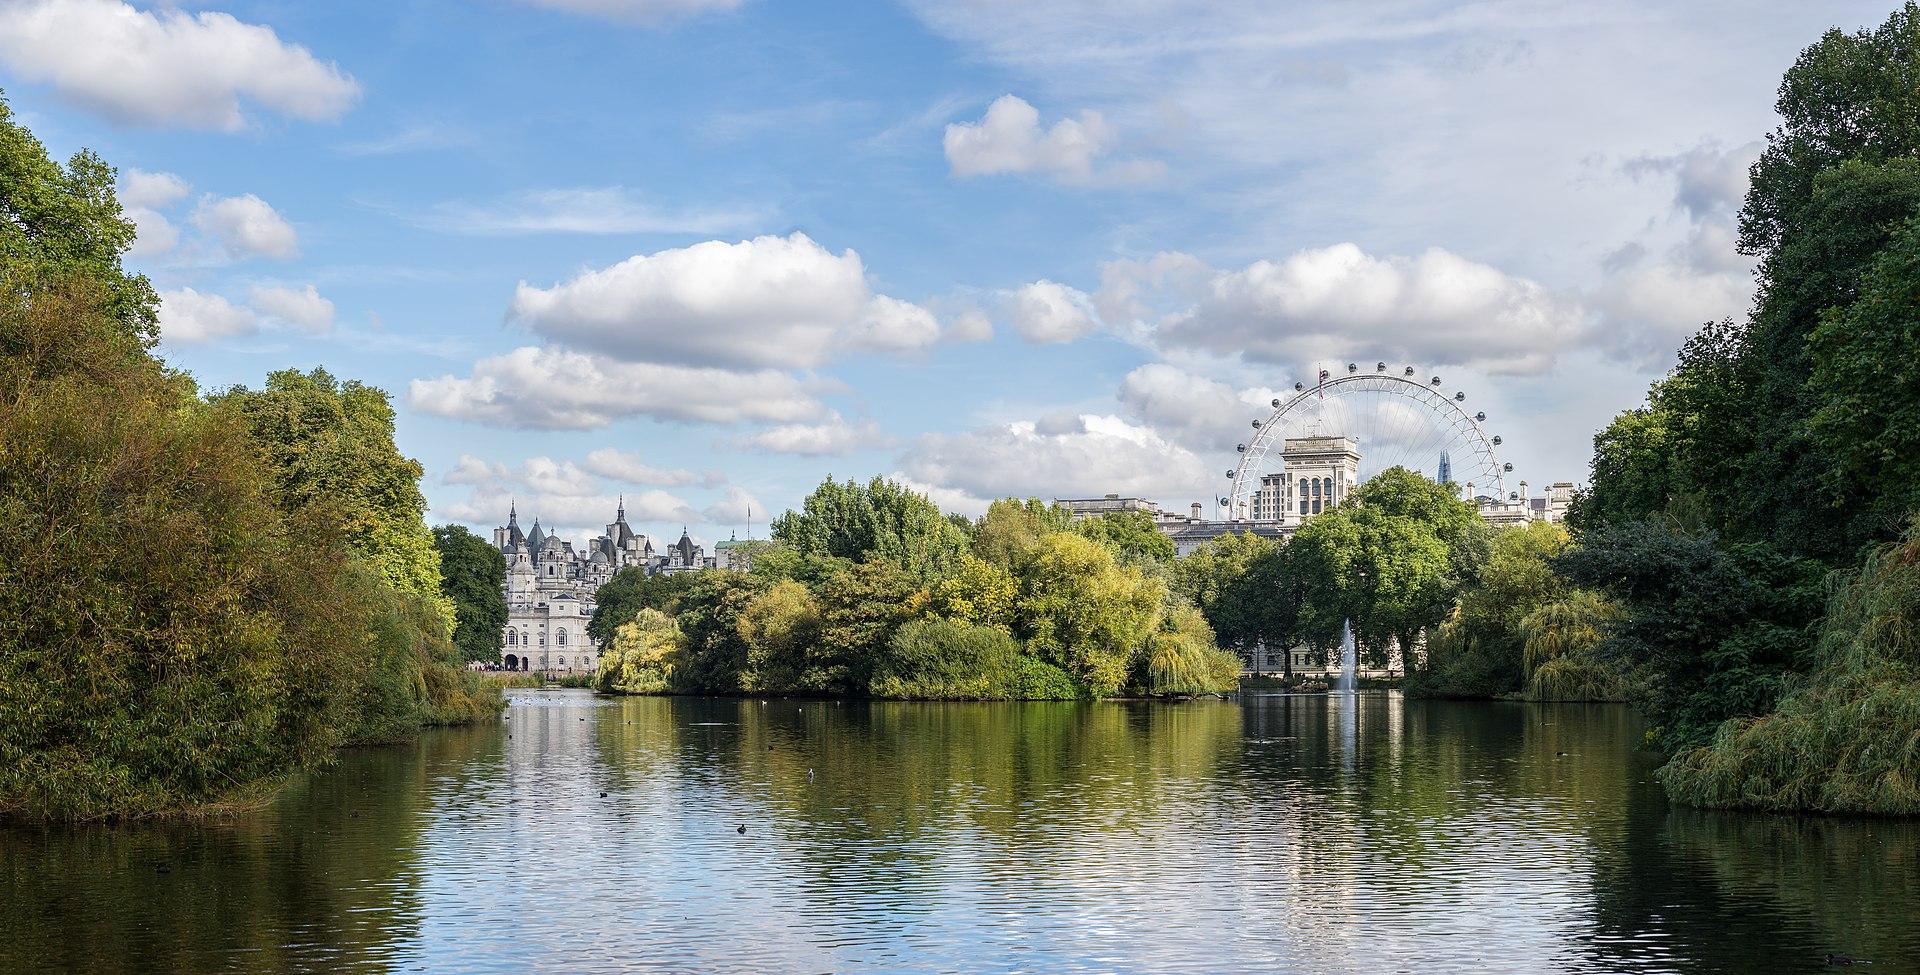 St James's Park - Wikipedia